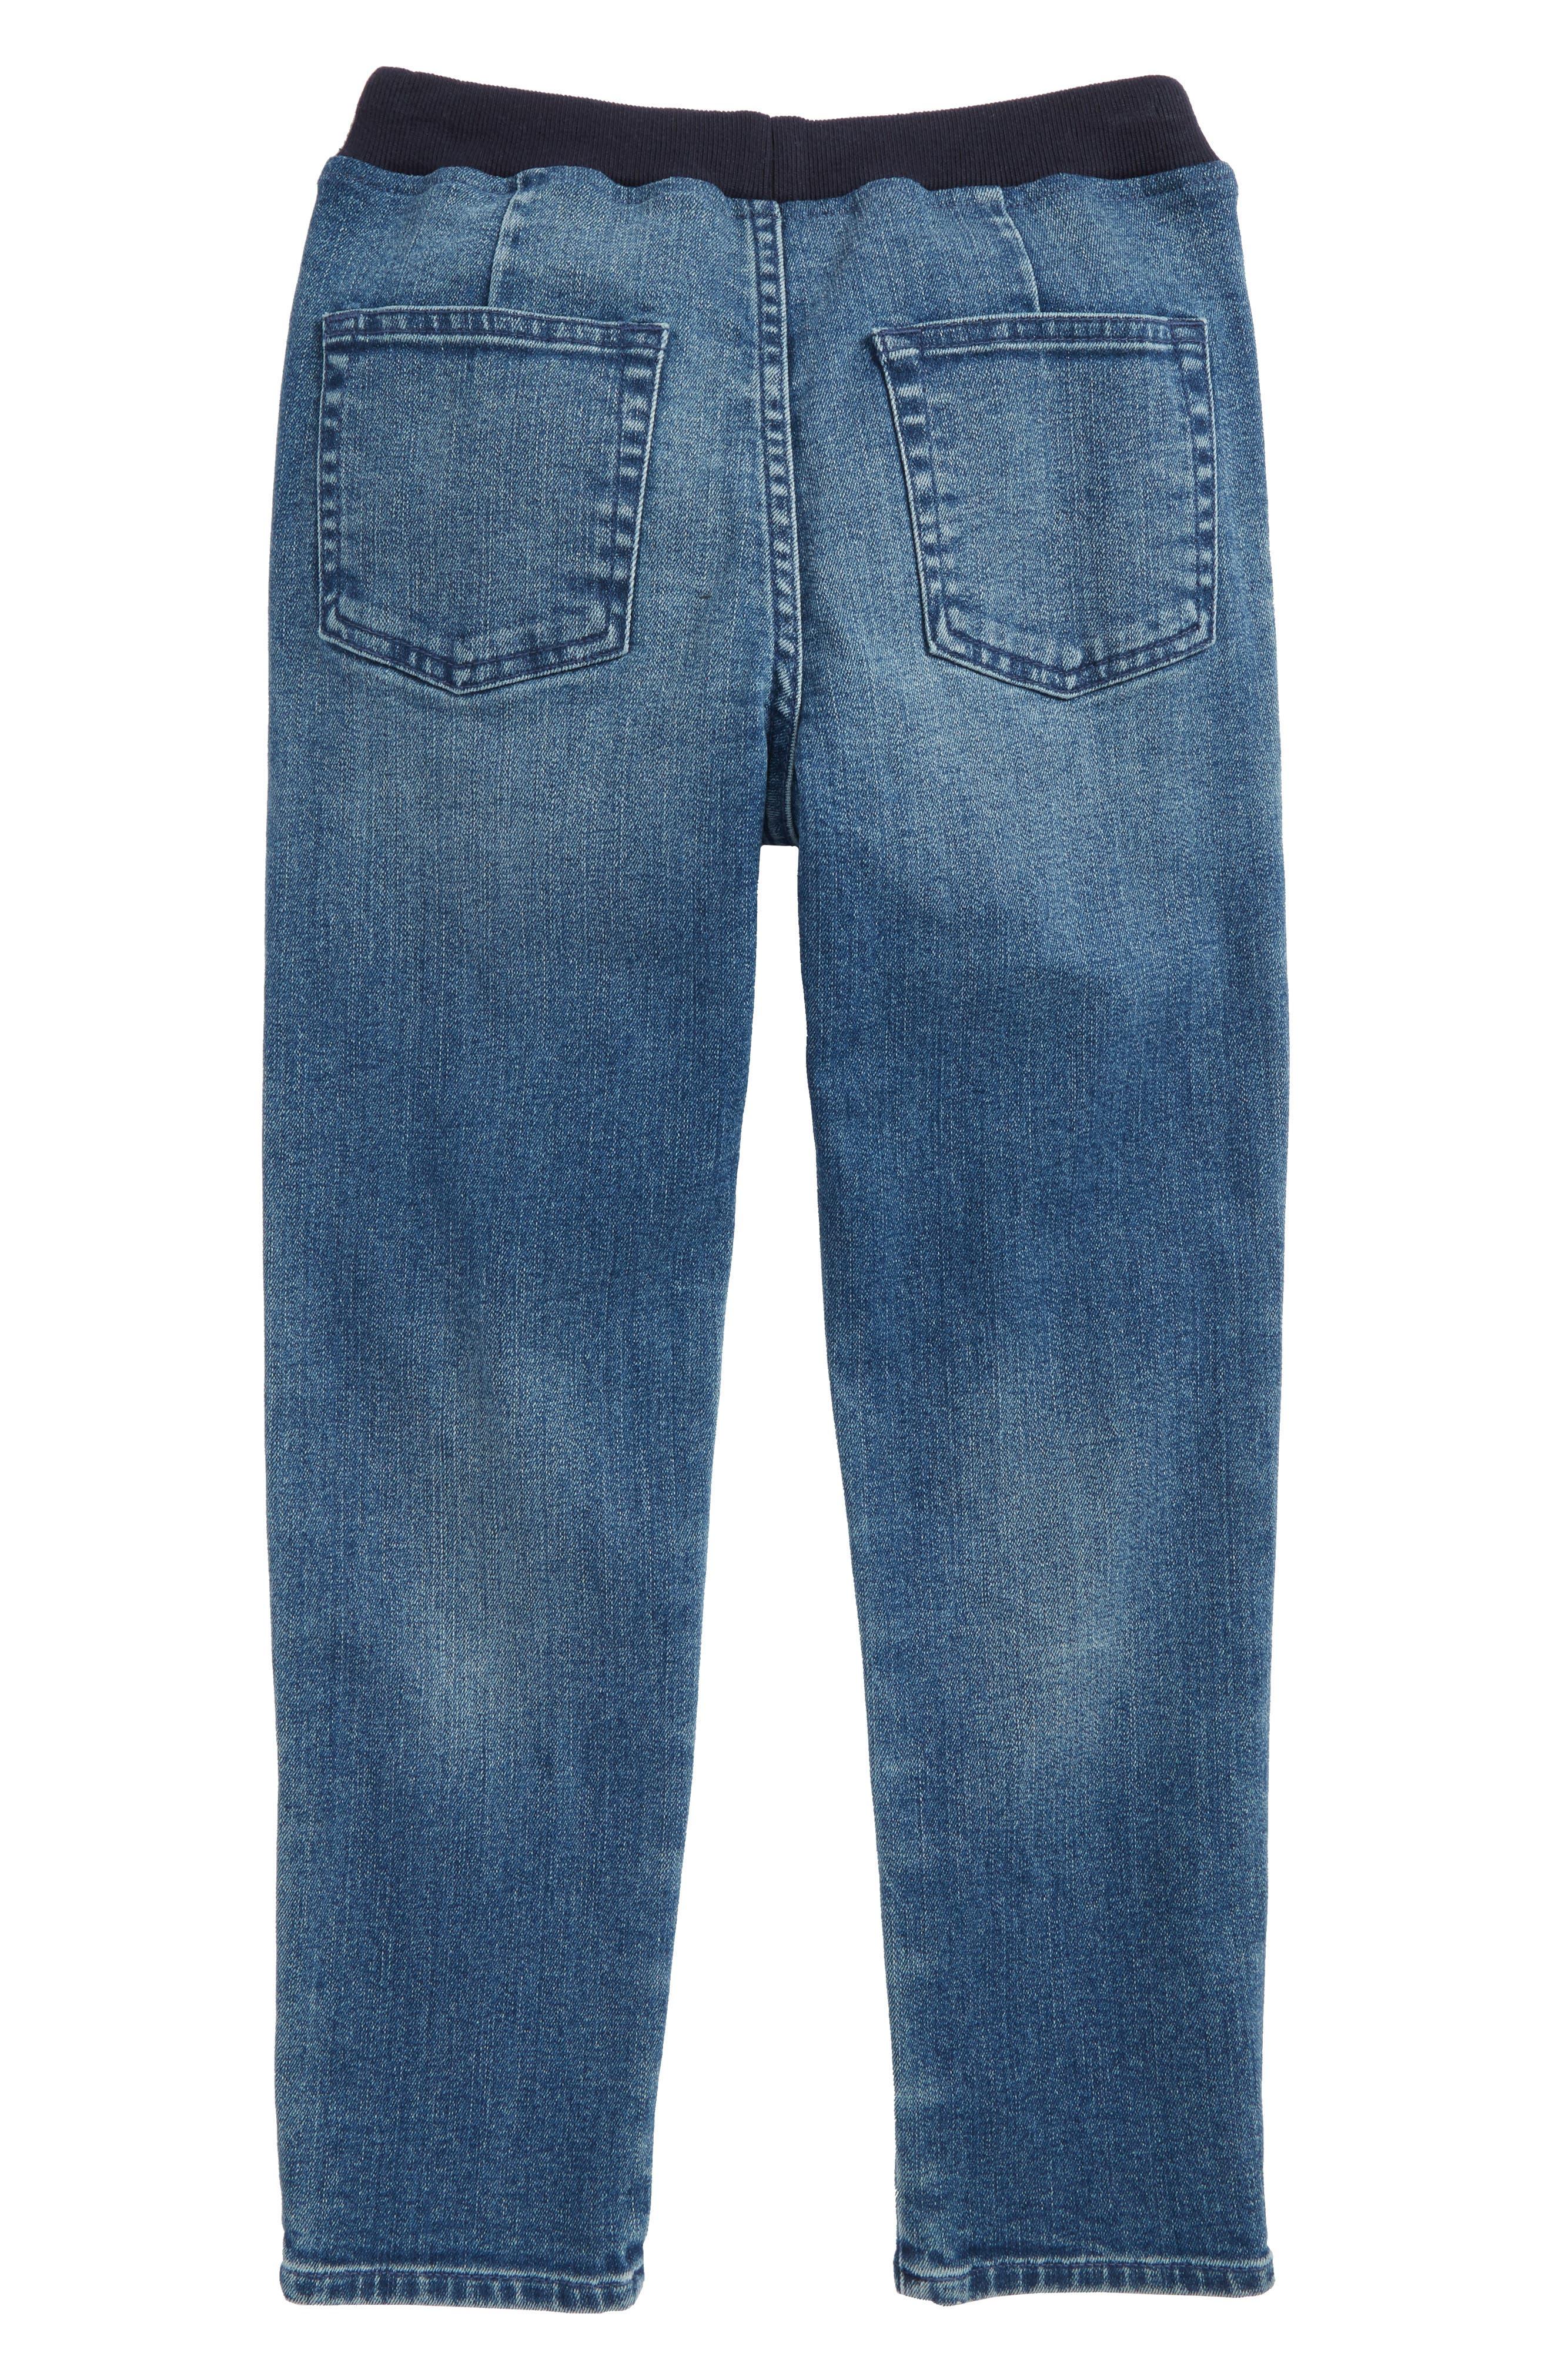 Pull-On Denim Pants,                             Alternate thumbnail 2, color,                             MEDIUM WASH